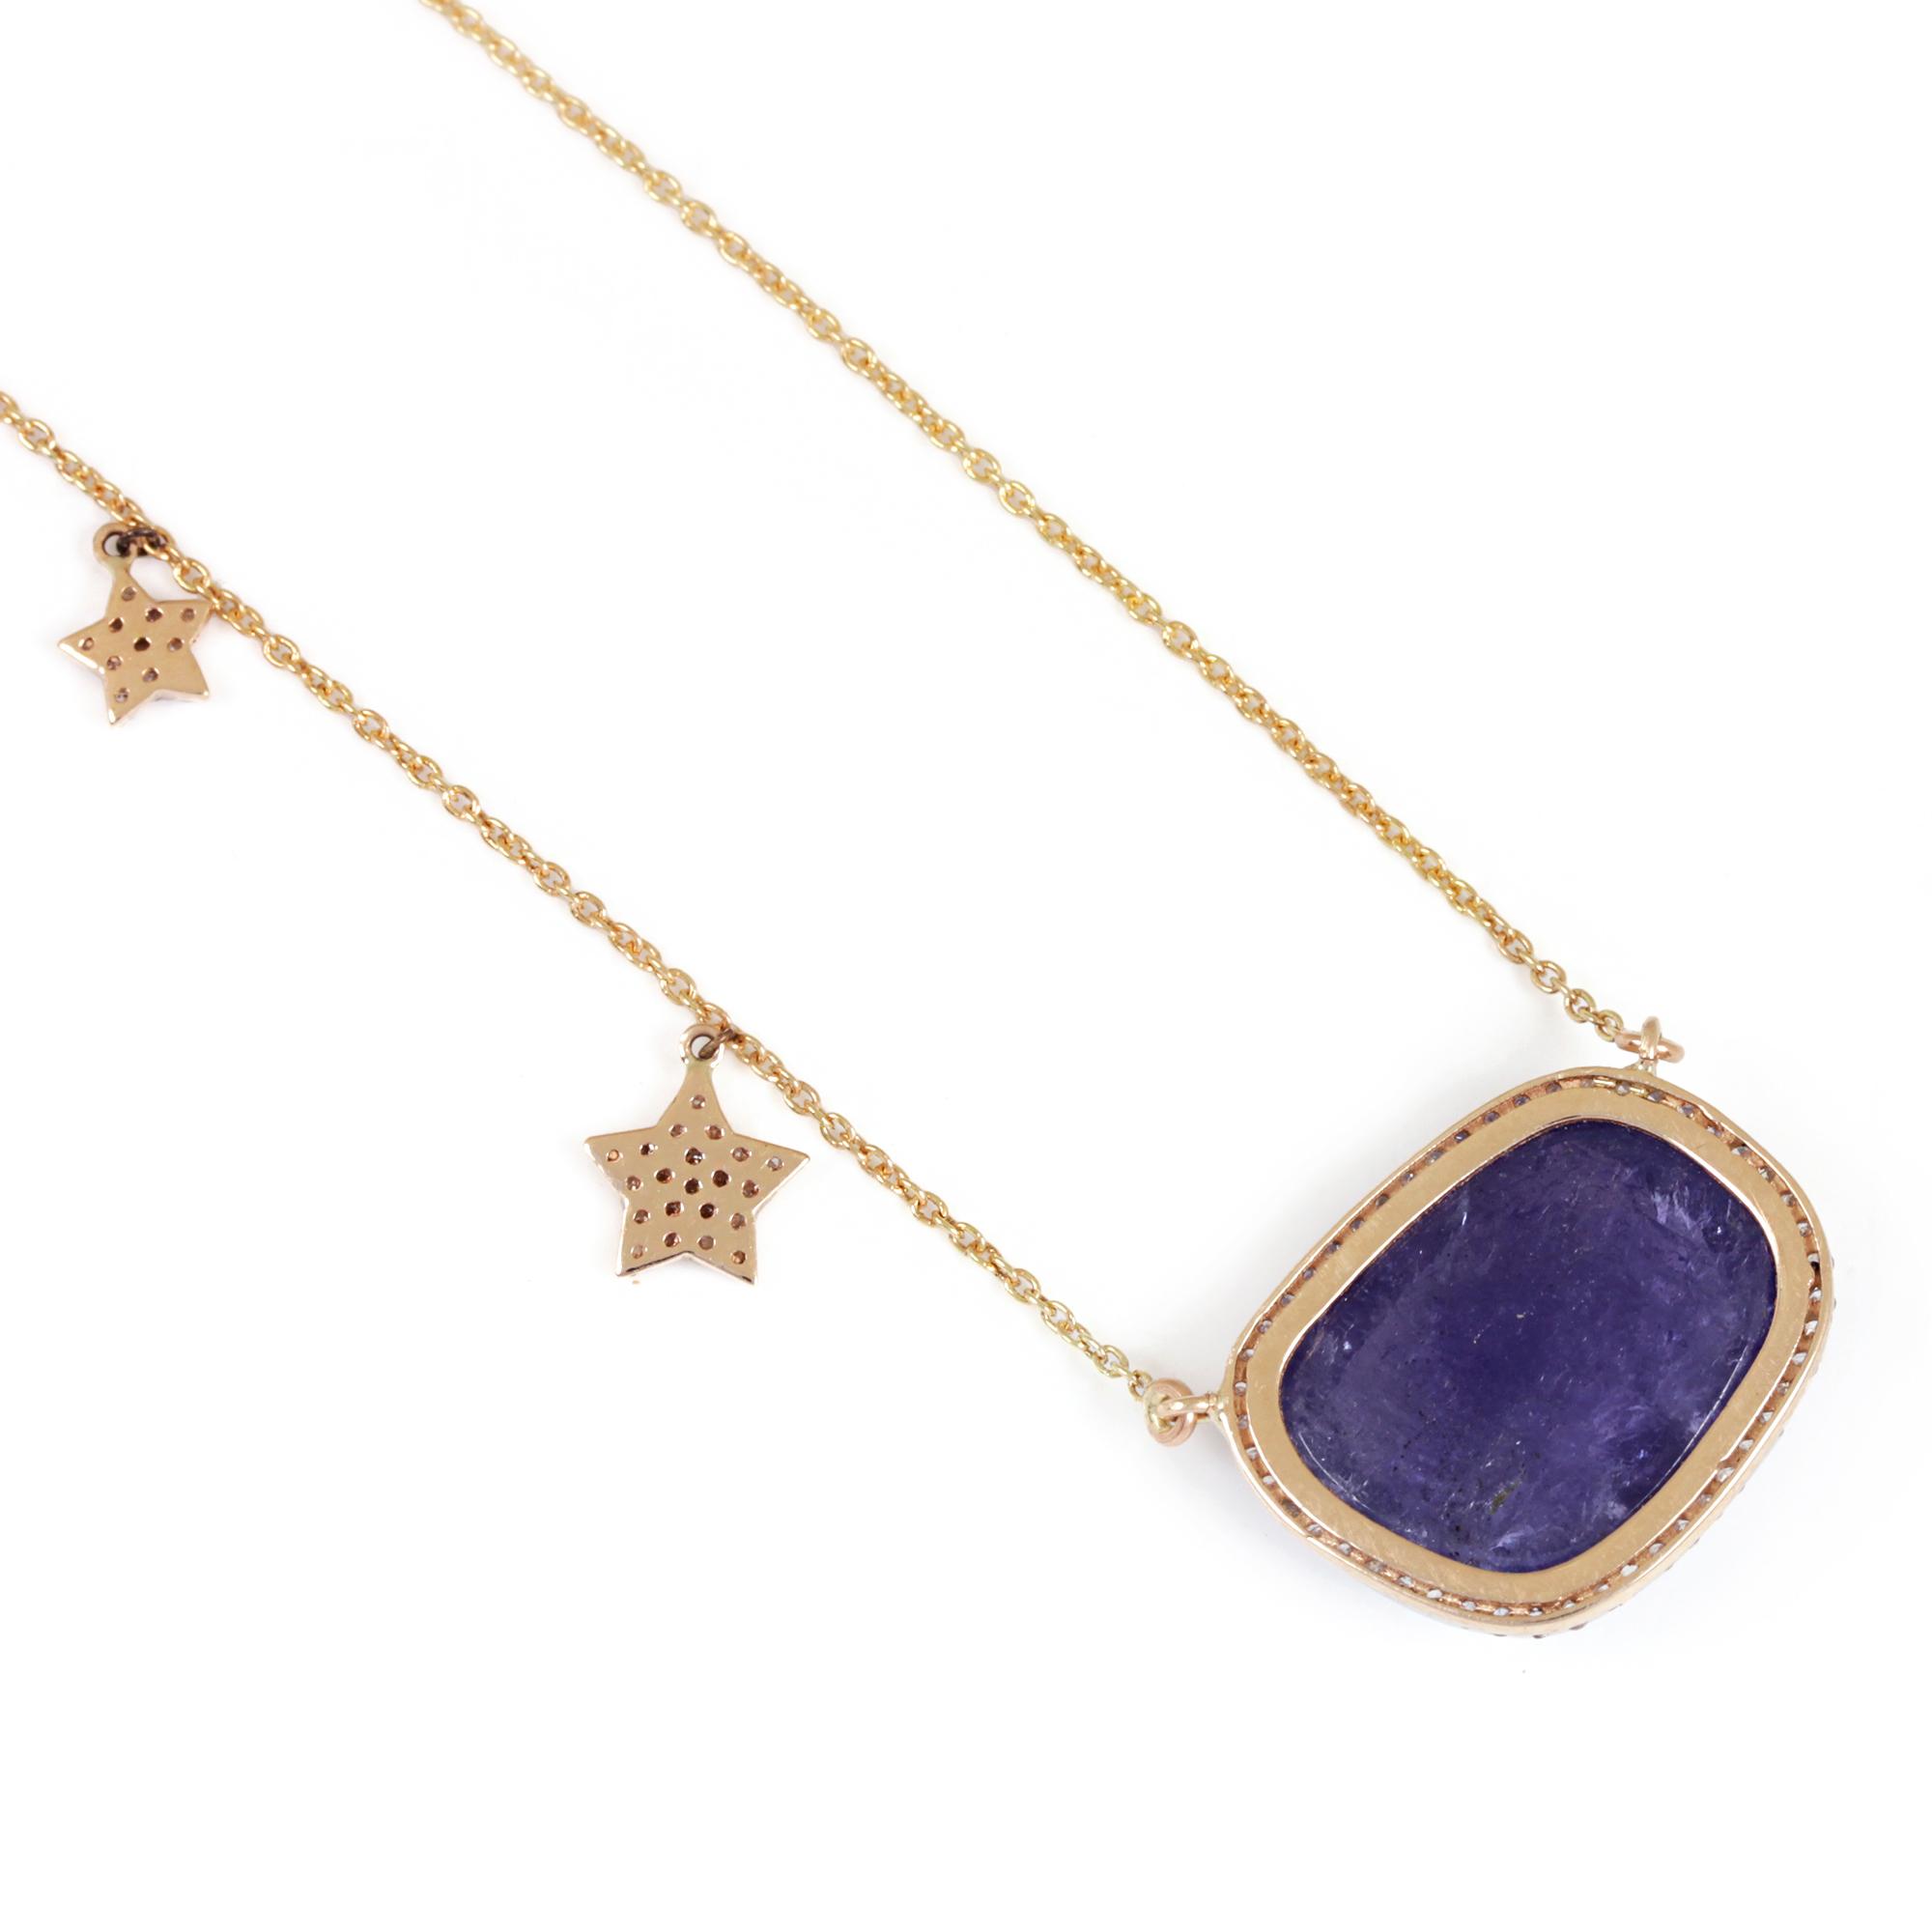 Pave Diamond Tanzanite Pendant Necklace 14K Solid Gold Chain Jewelry